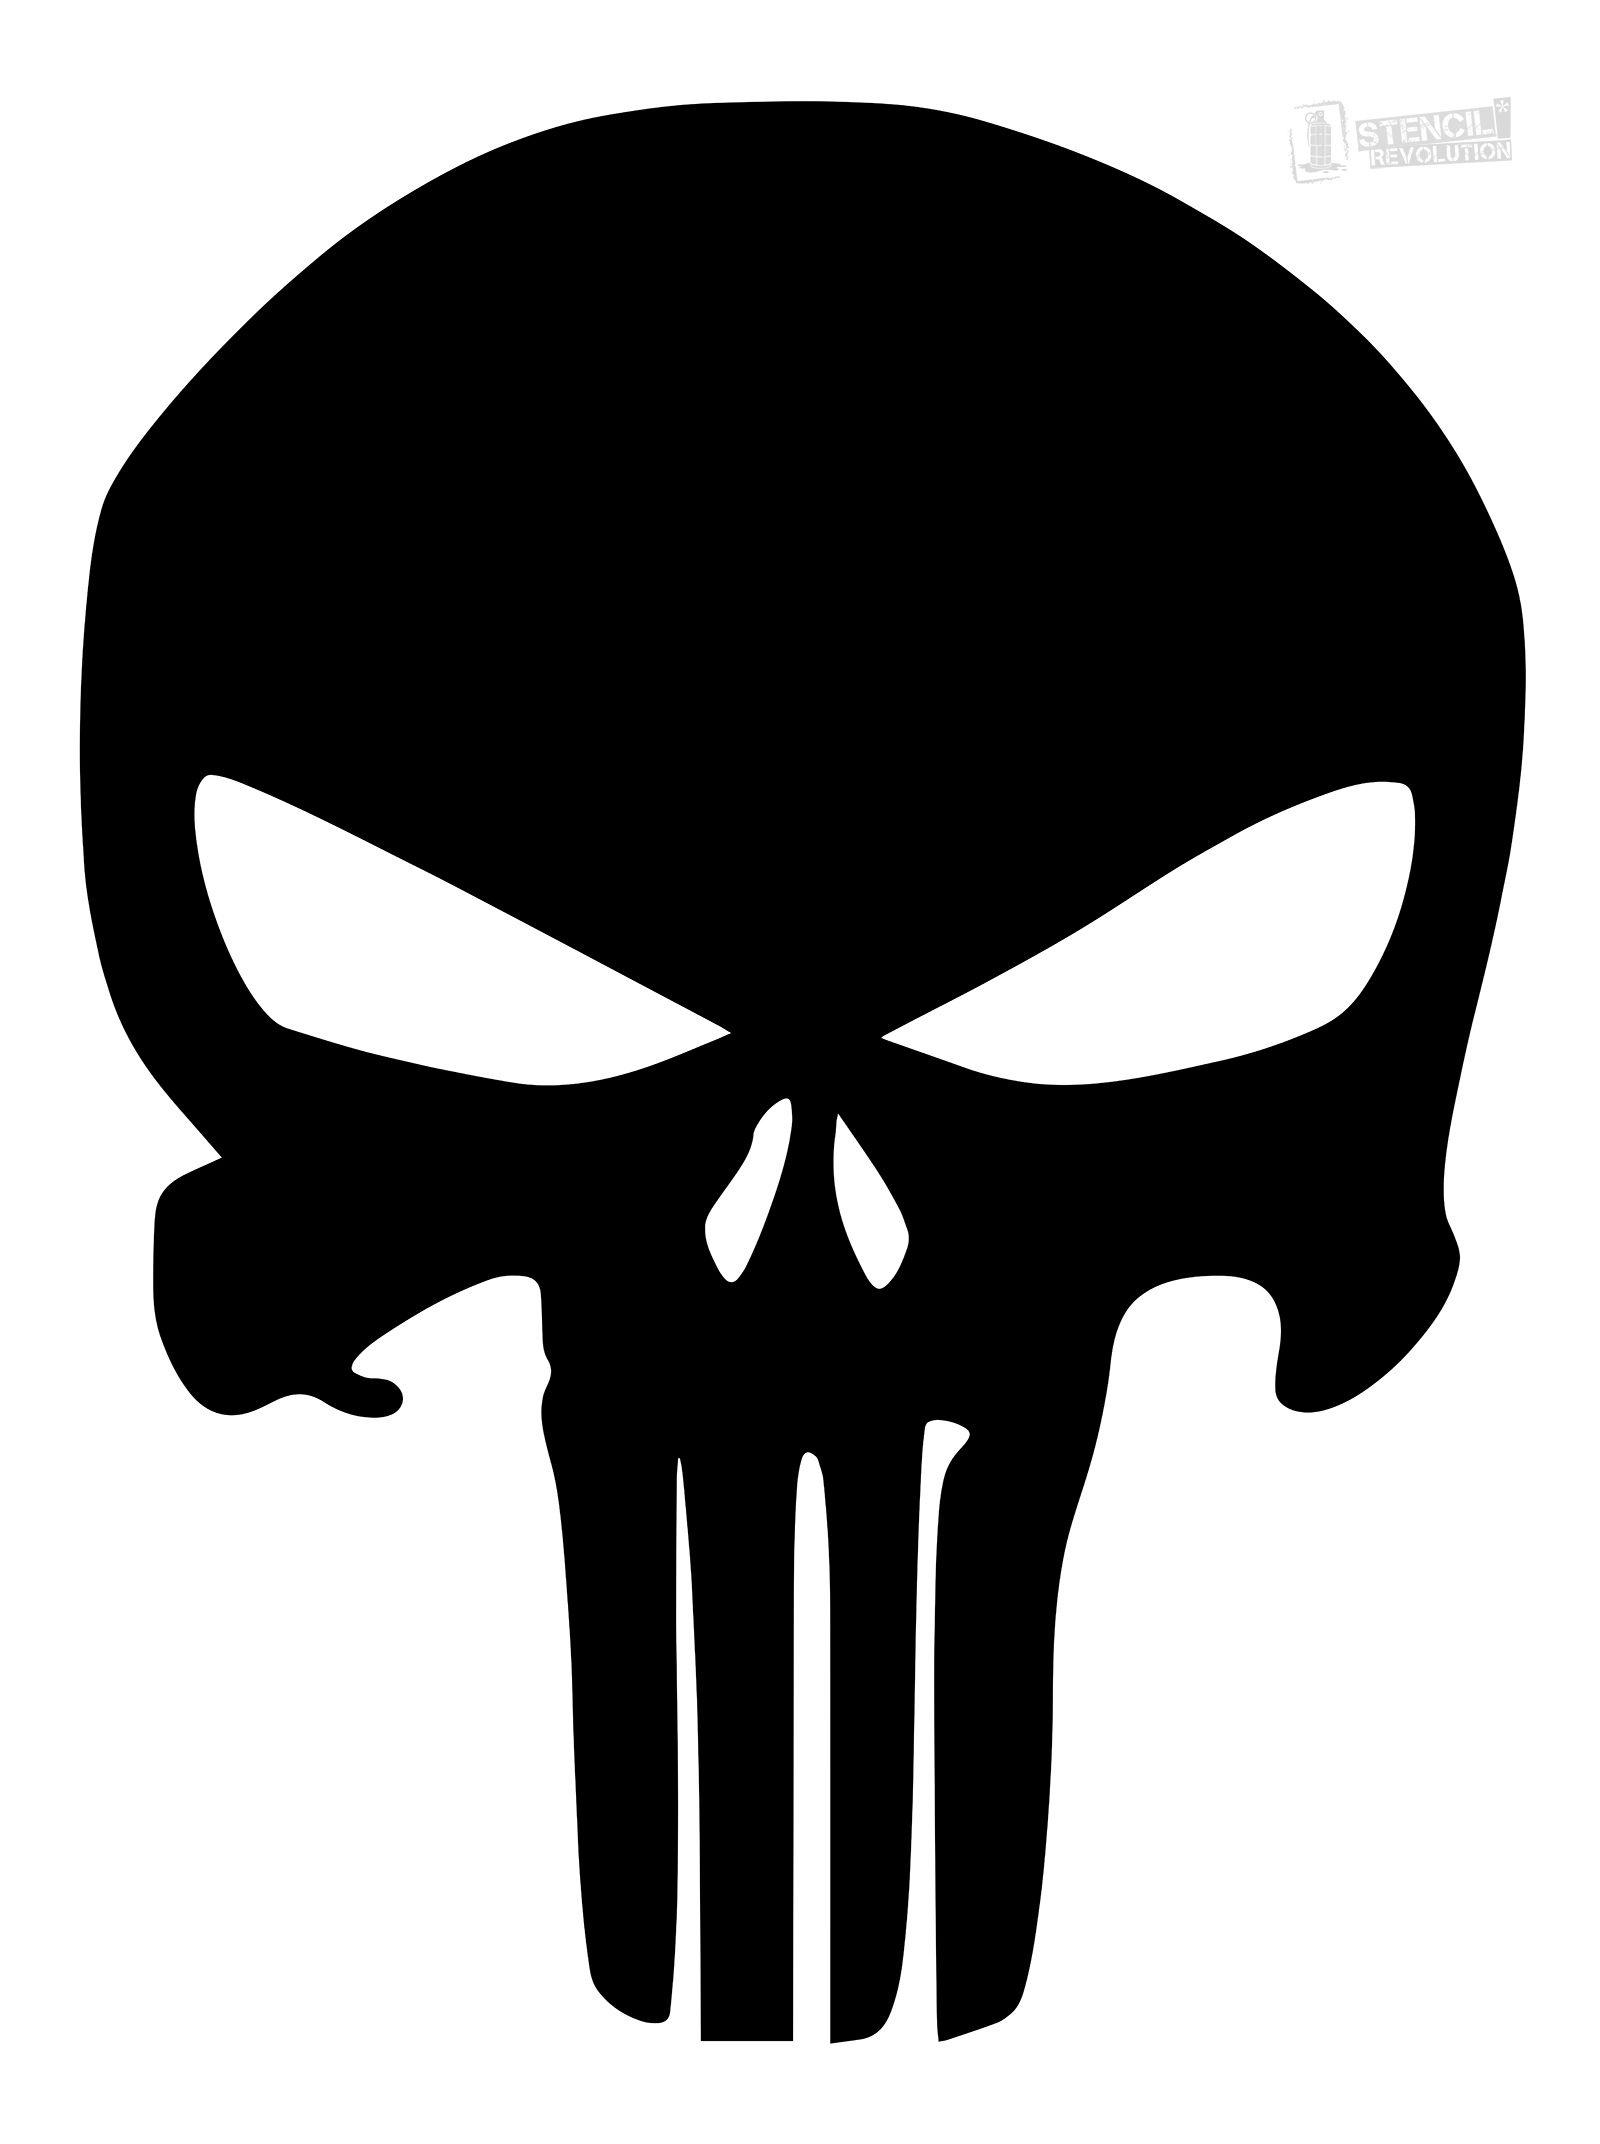 Skull Stencils Free Printable | Free Printable A to Z